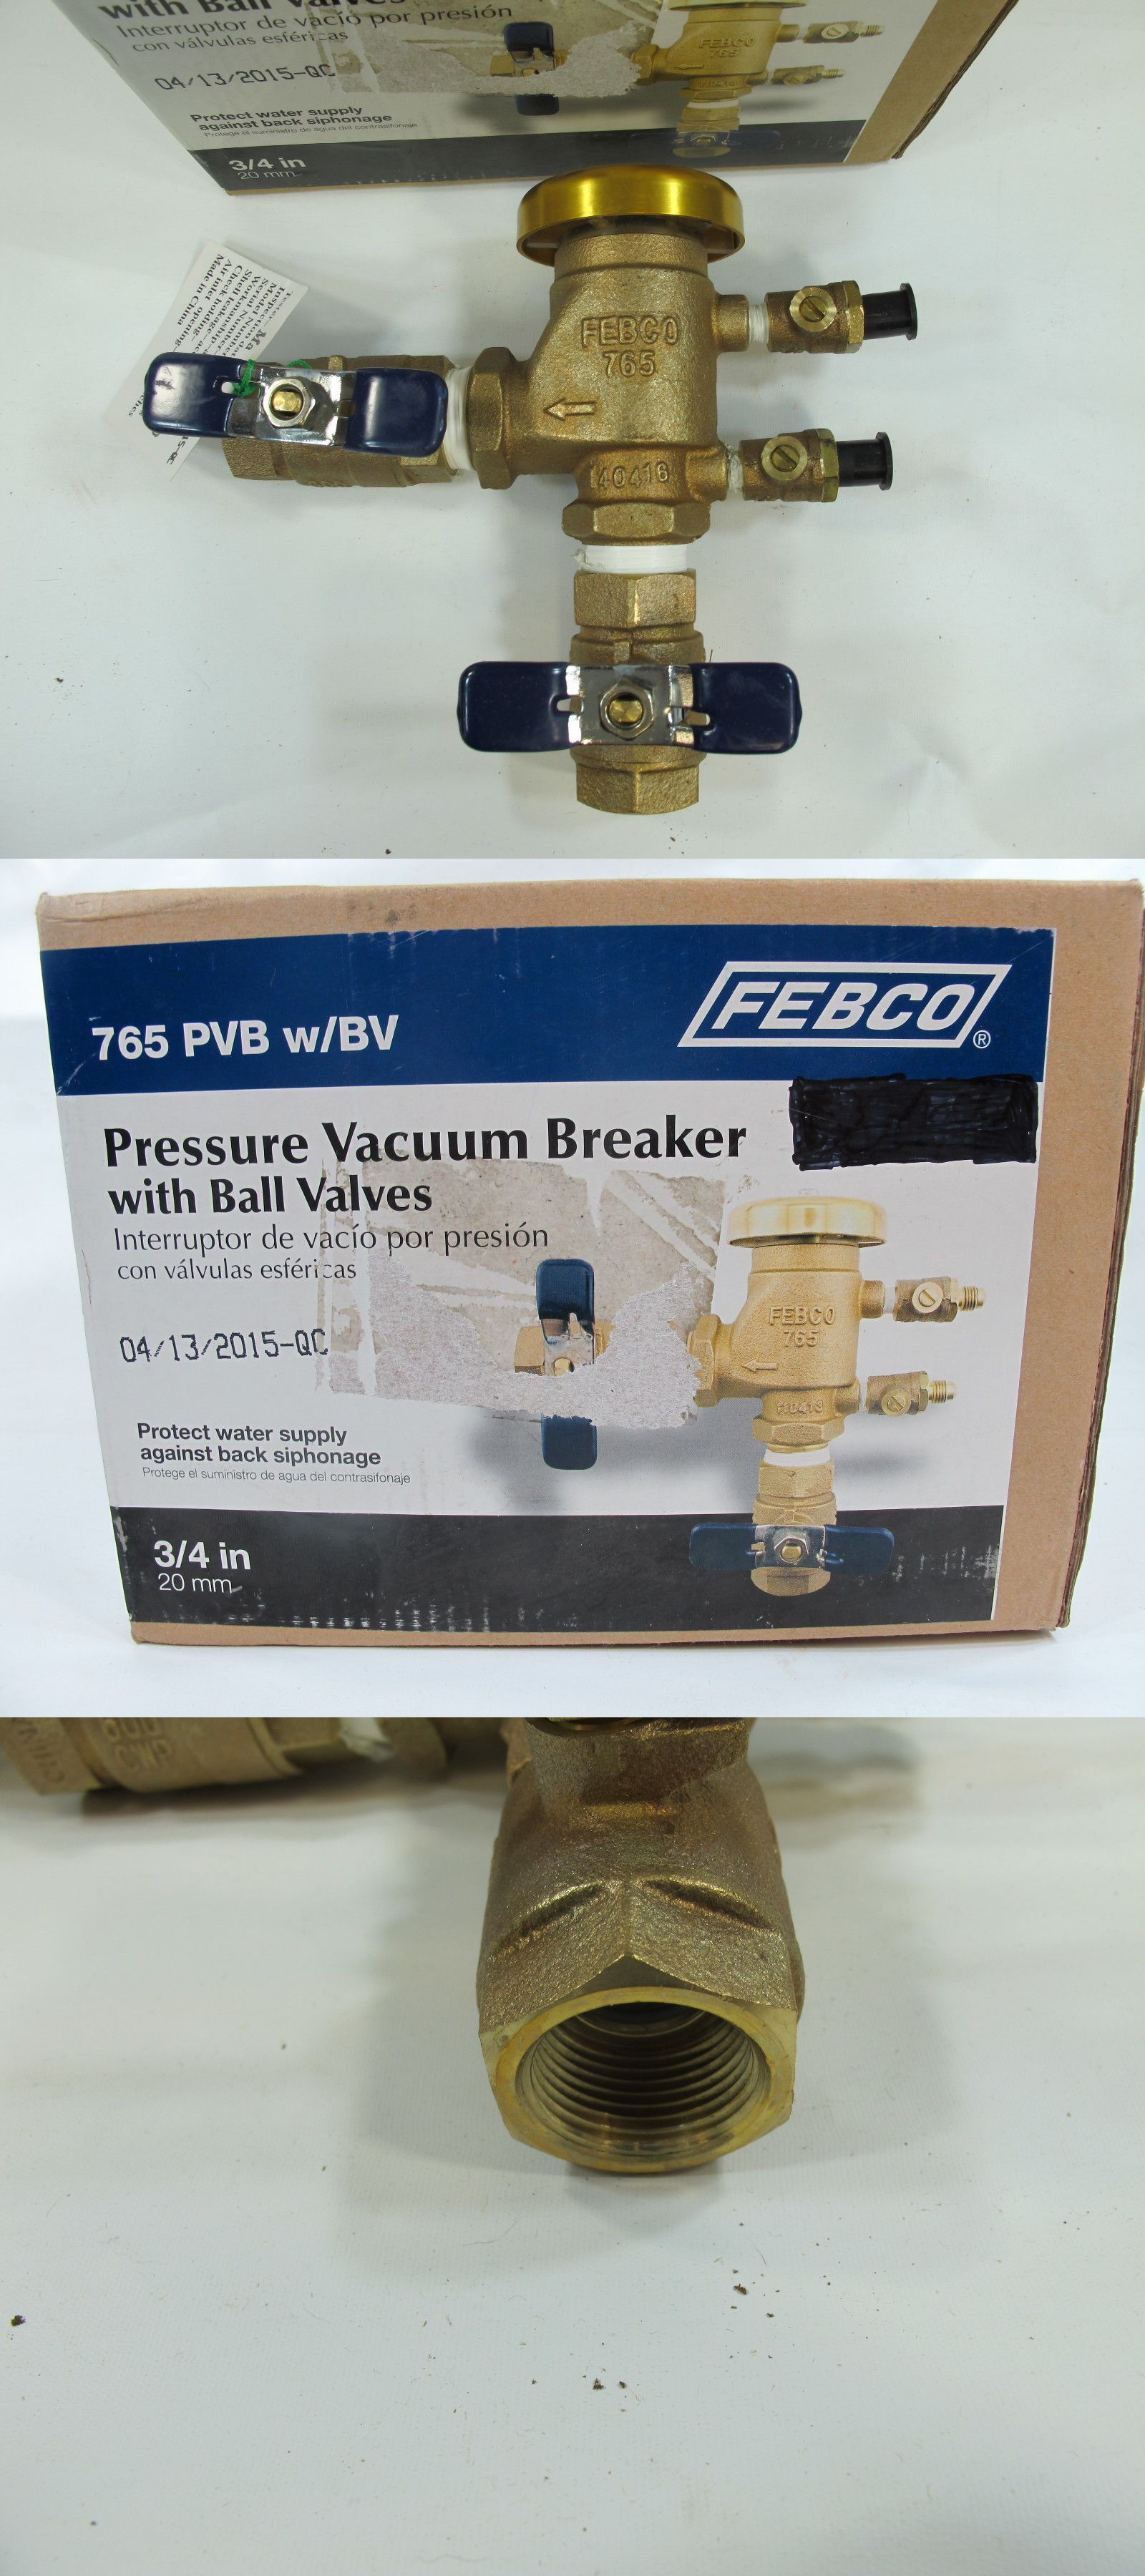 Valves 75673 Febco 3 4 765 Pvb W Bv Vacuum Breaker Backflow Buy It Now Only 75 On Ebay Valves Febco Vacuum Breaker Backflow Vacuums Ebay Breakers